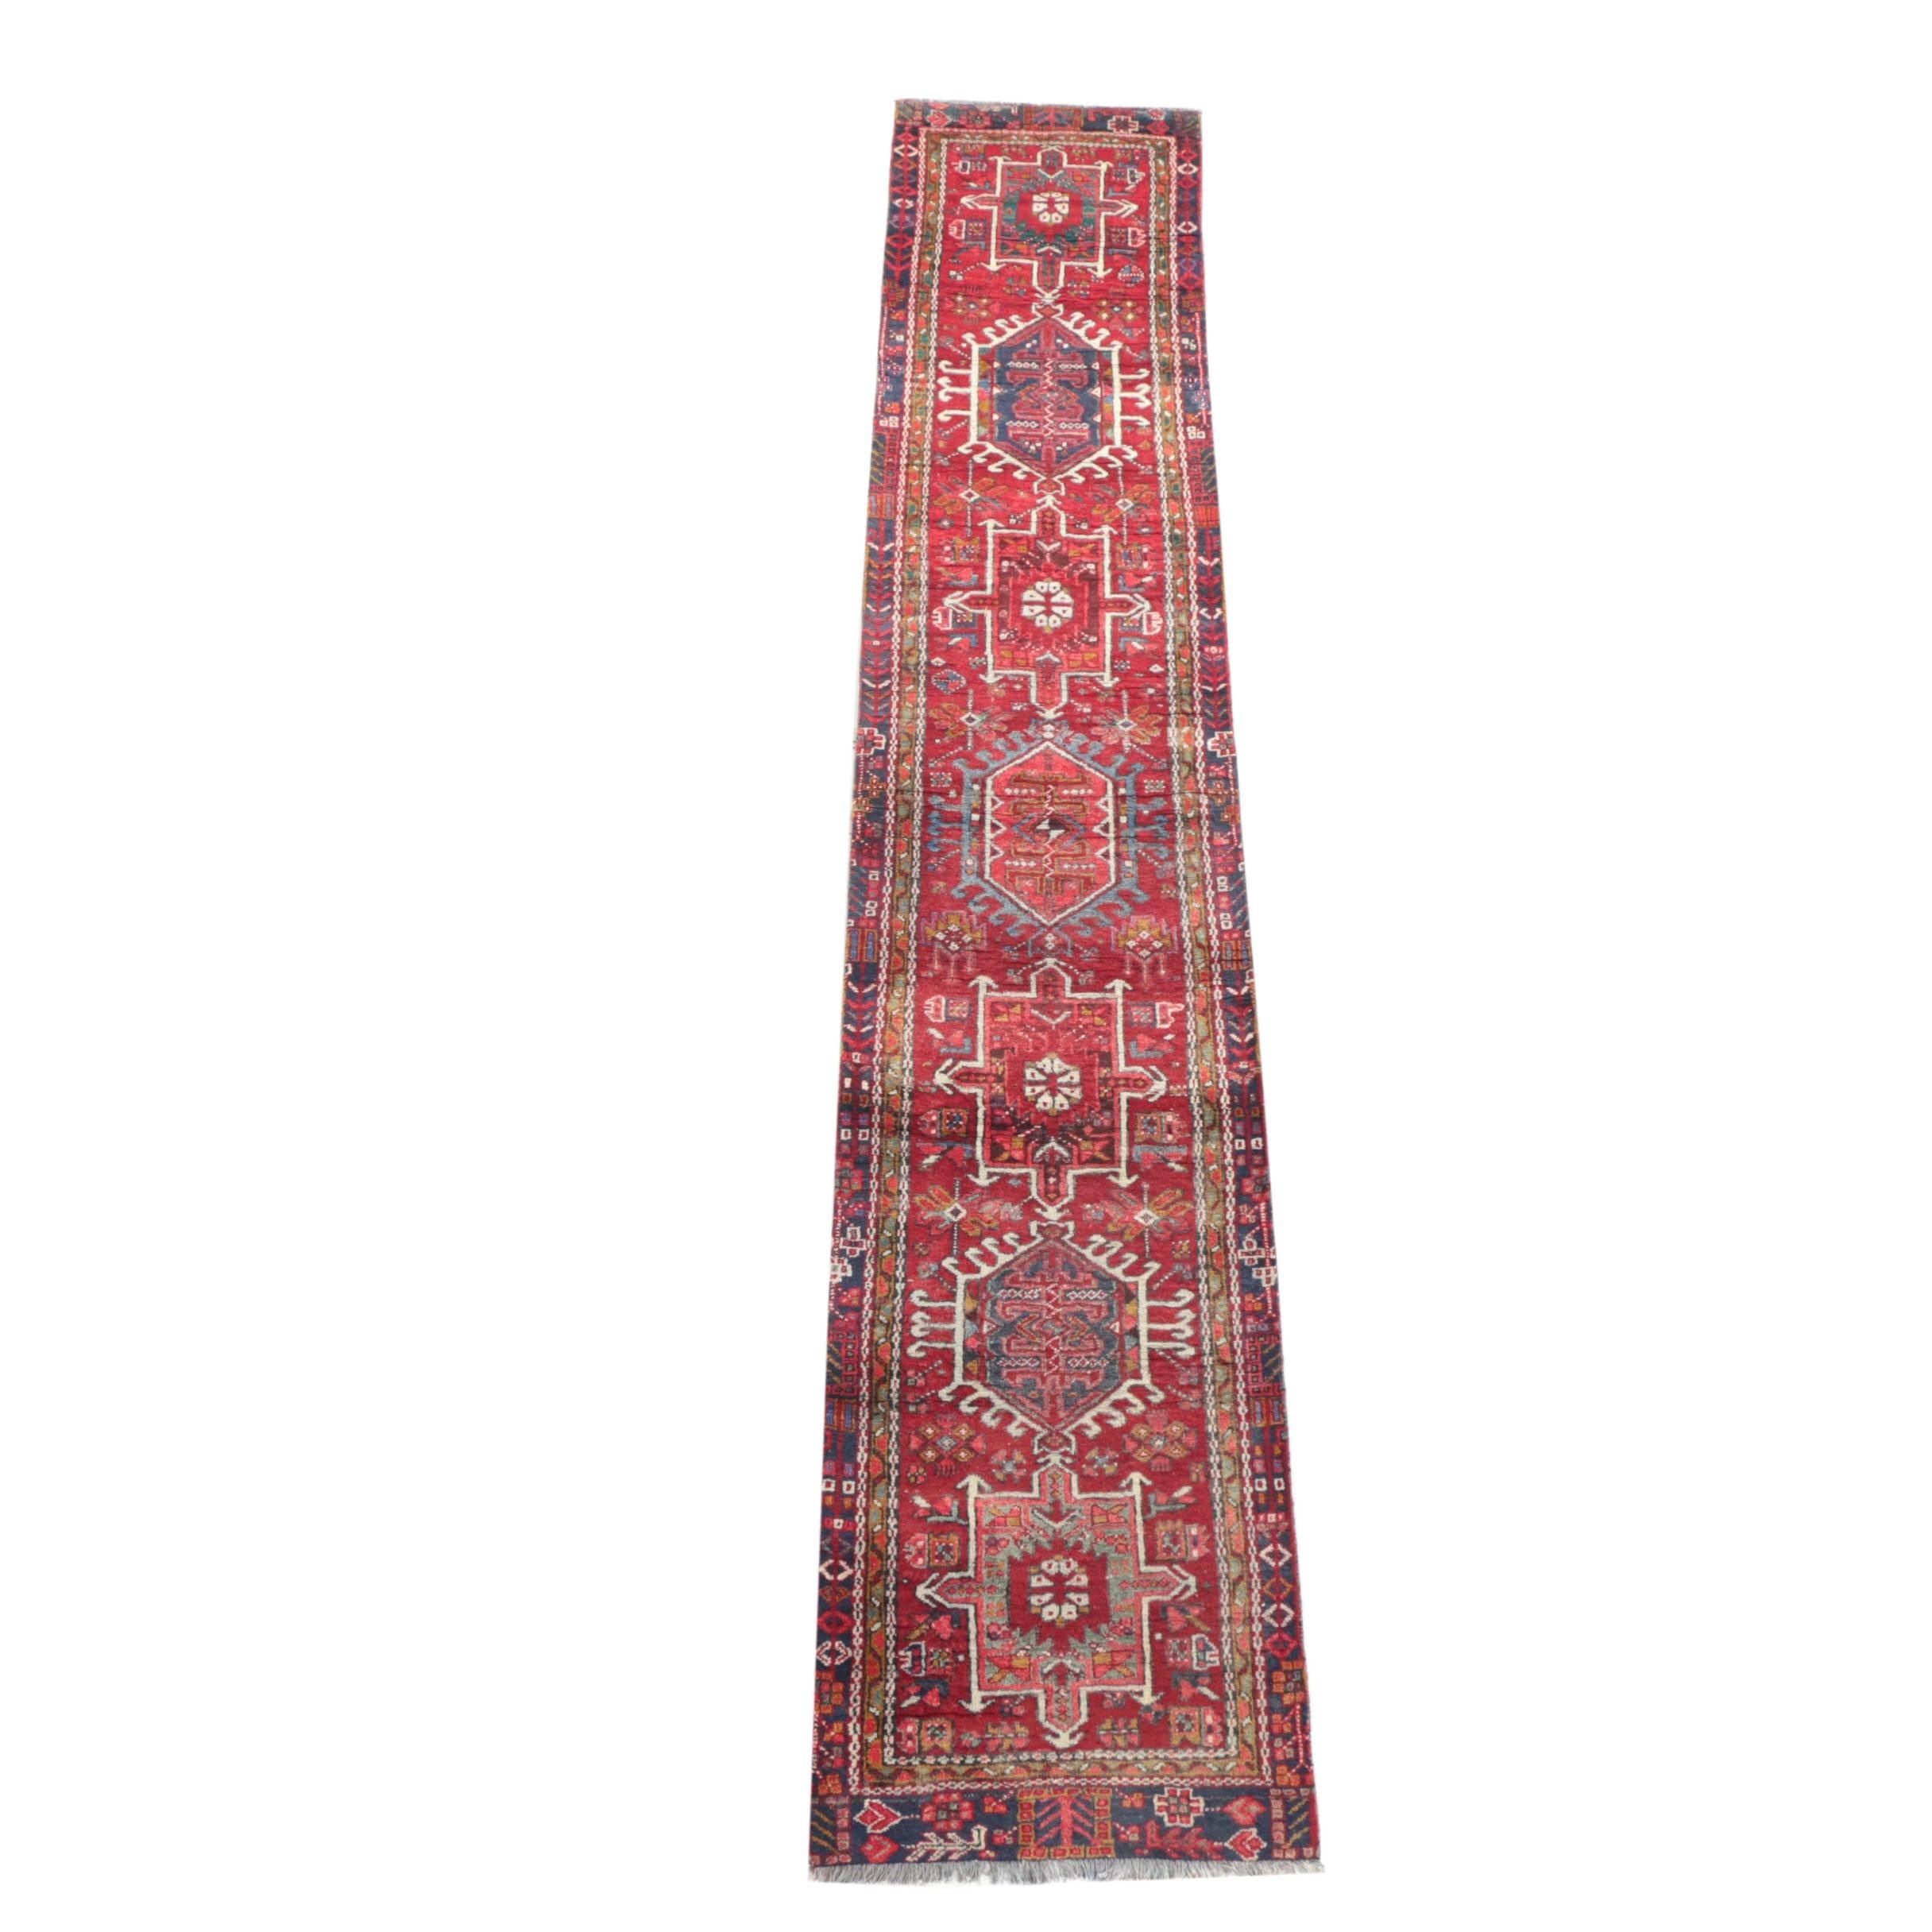 Hand-Knotted Persian Karaja Carpet Runner